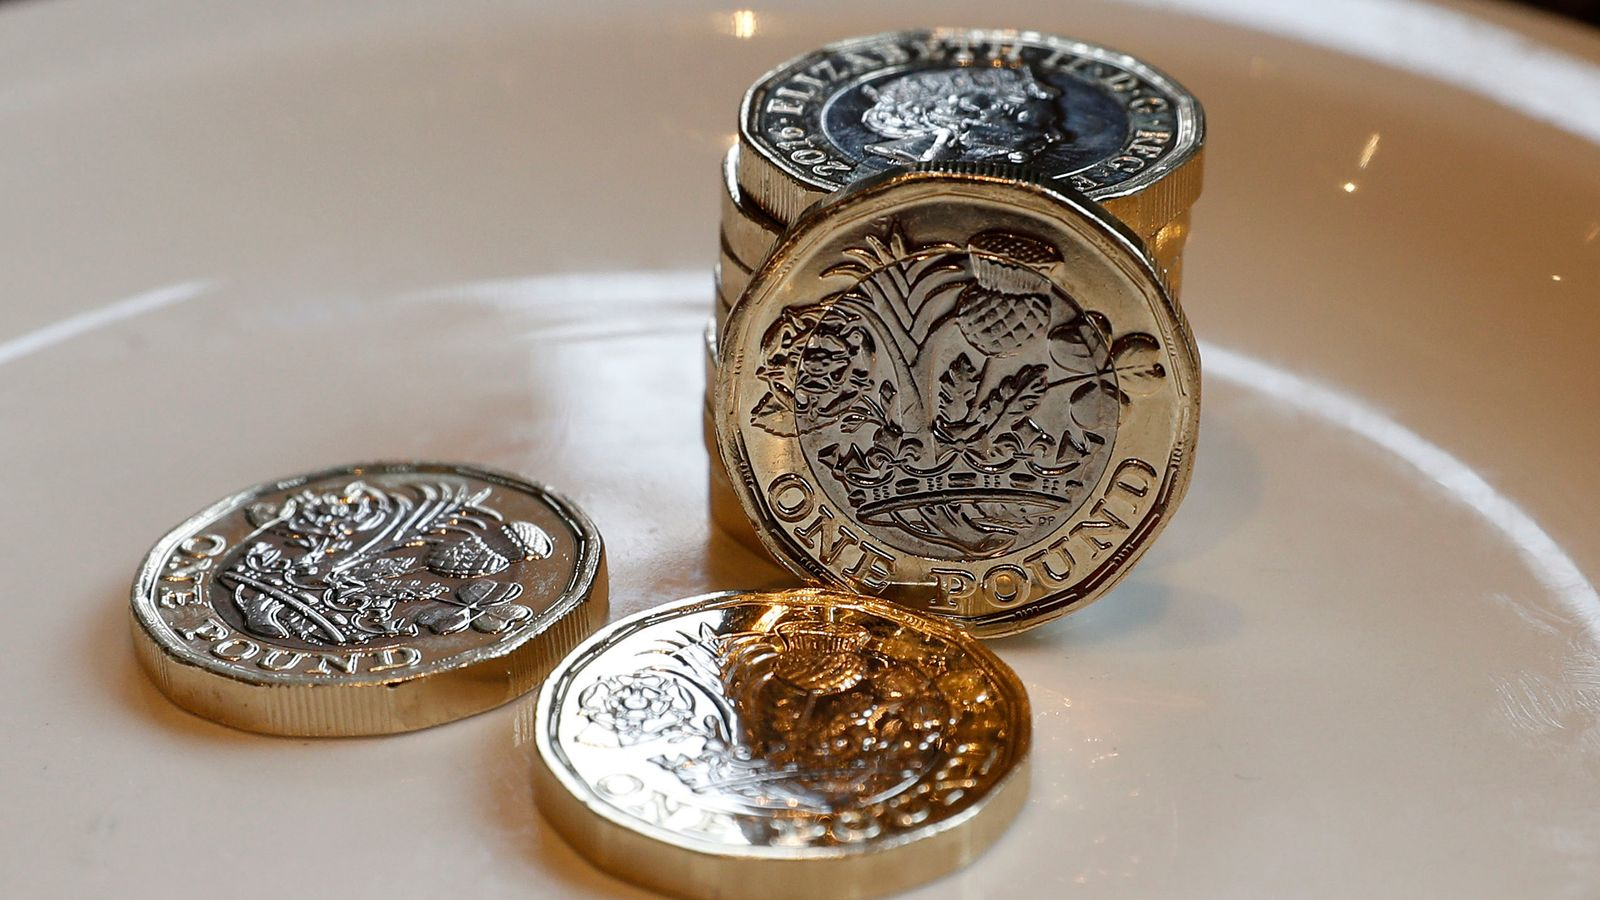 New £1 coin hits one billion landmark as 'round pound' deadline looms